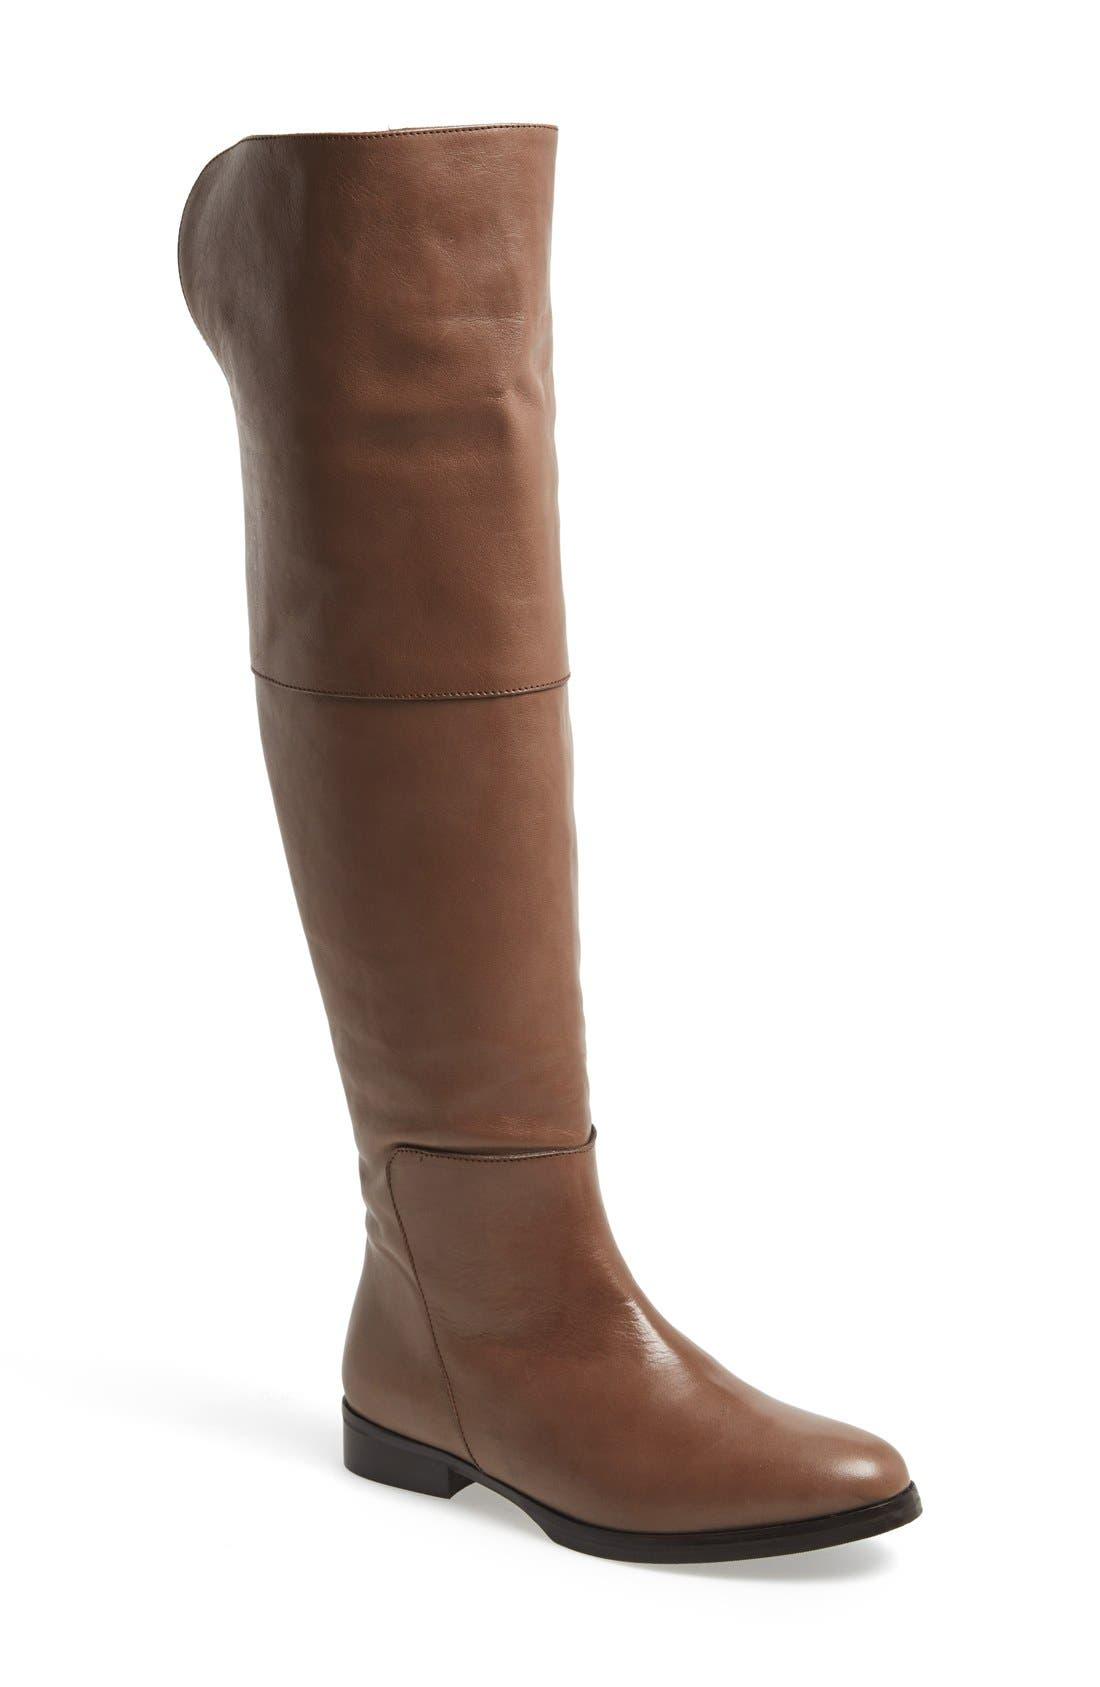 Main Image - Charles by Charles David 'Regina' Over-The-Knee Boot (Women)